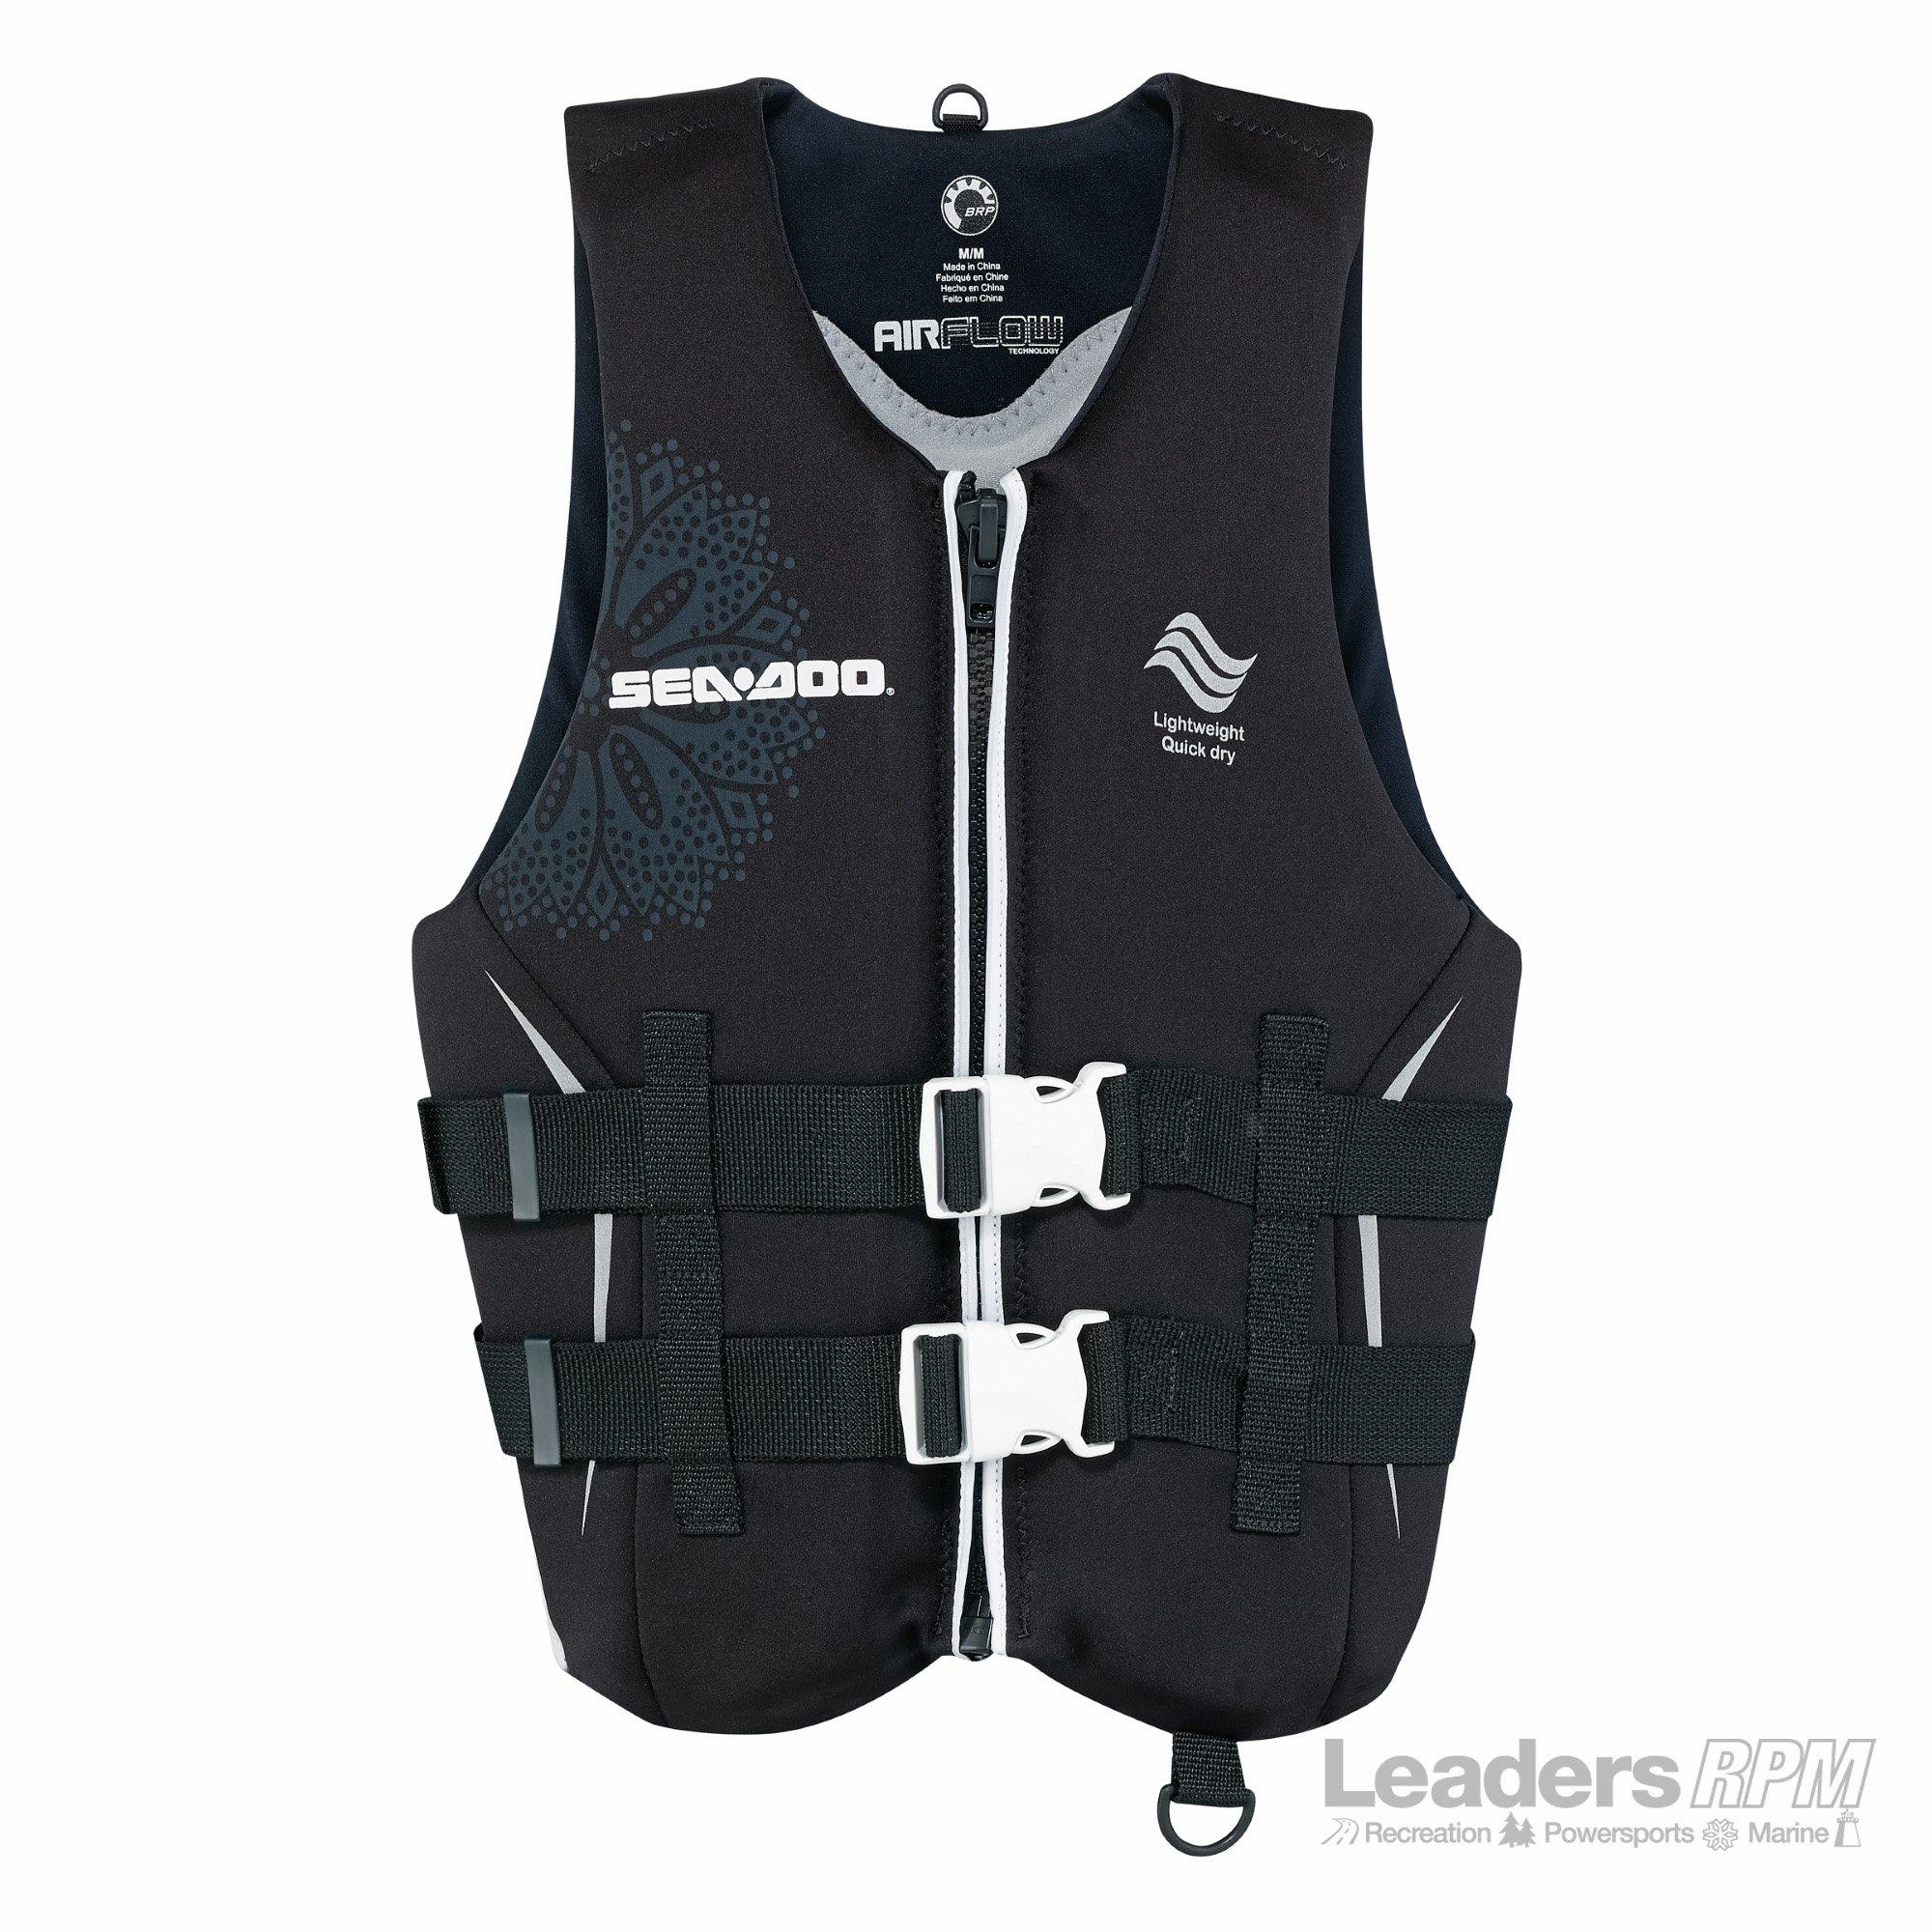 BRP Sea-Doo Men's 2015 Ecoprene Airflow PFD Life Vest Jacket (3X-Large)